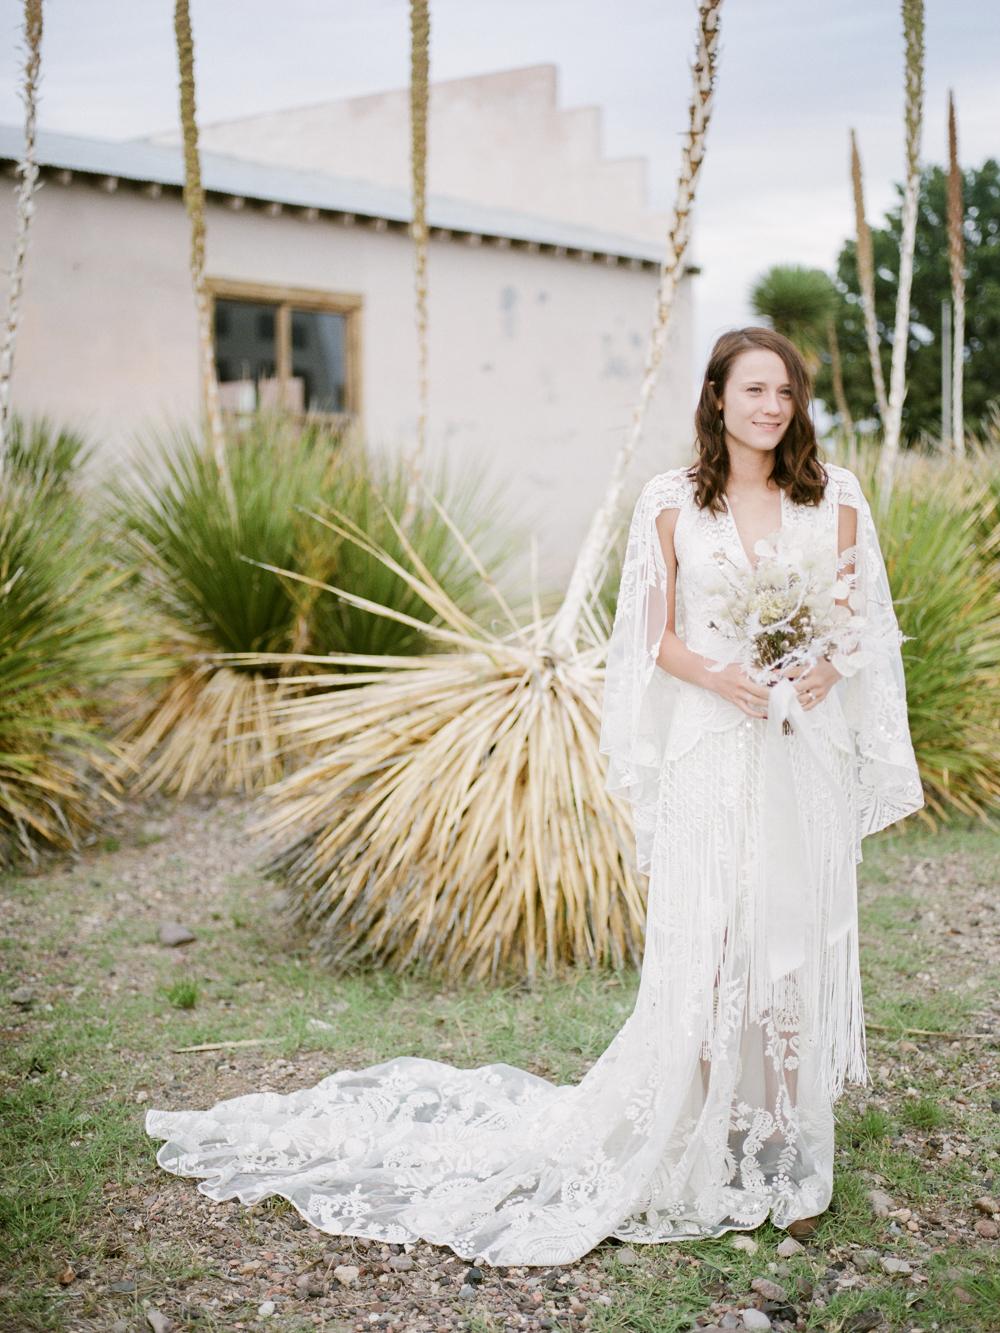 Marfa wedding photographer- destination wedding photographer-christine gosch - film photographer - elopement photographer-6.jpg